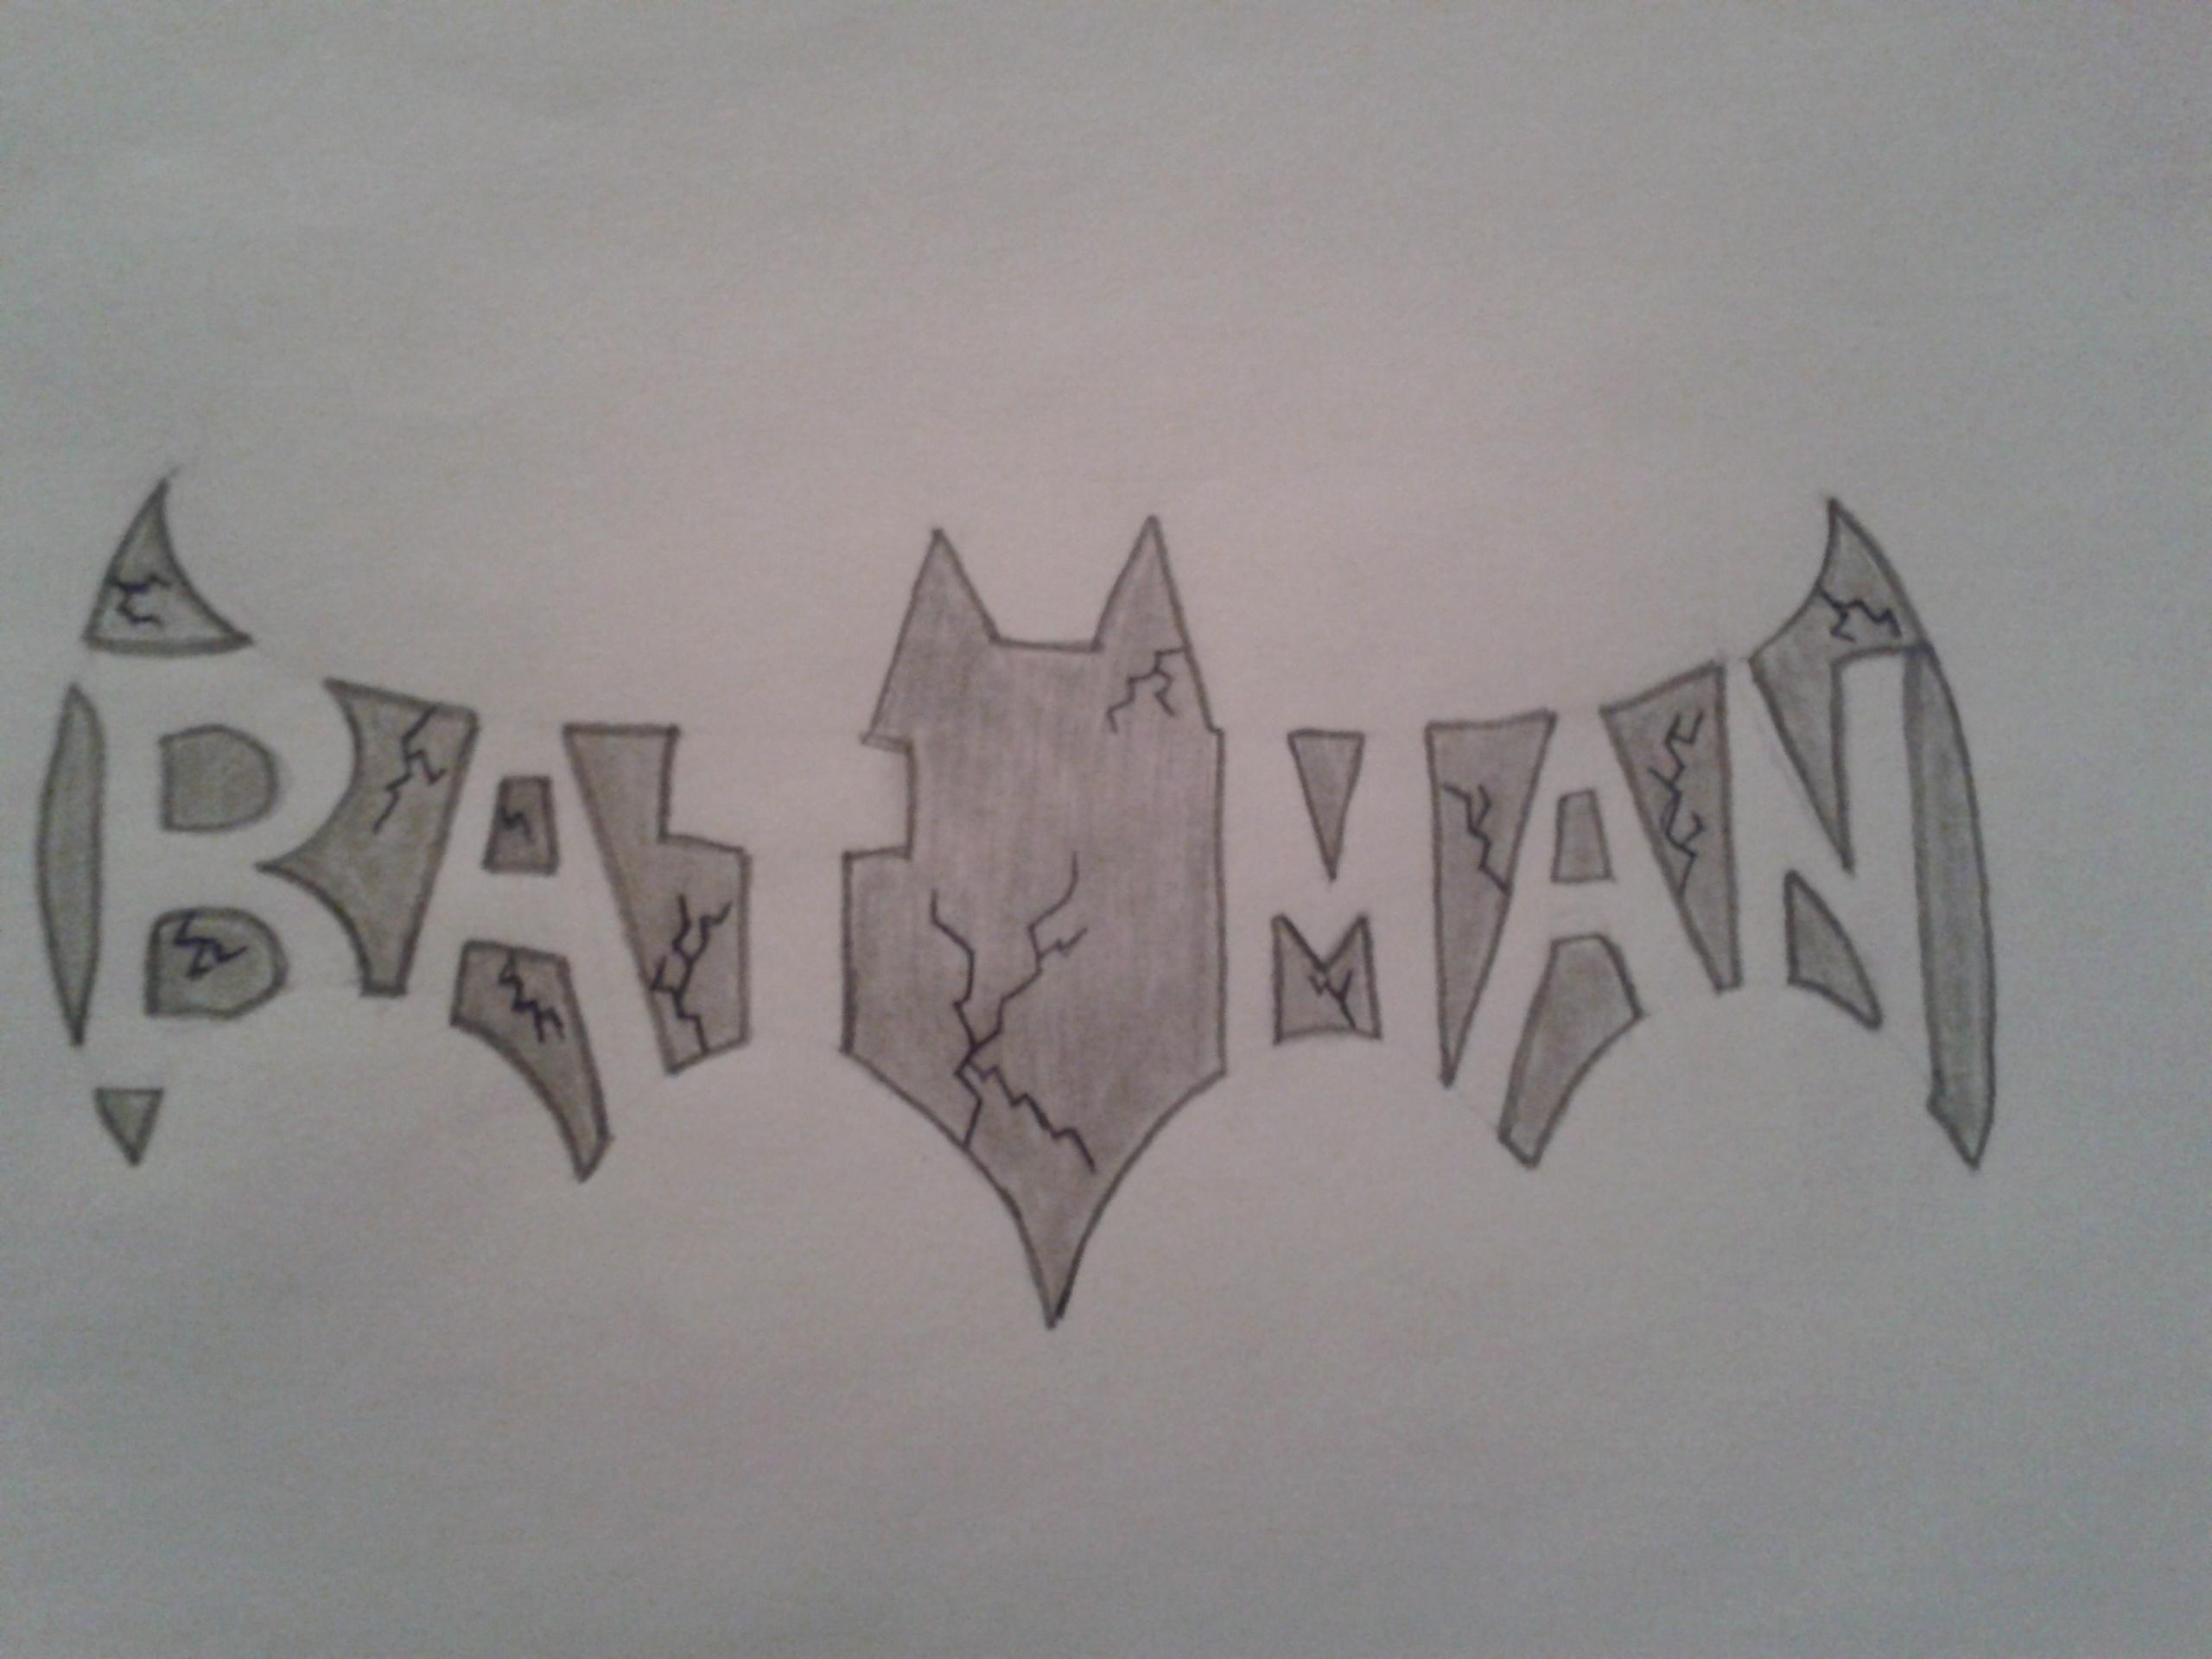 How to draw: A cool Batman symbol